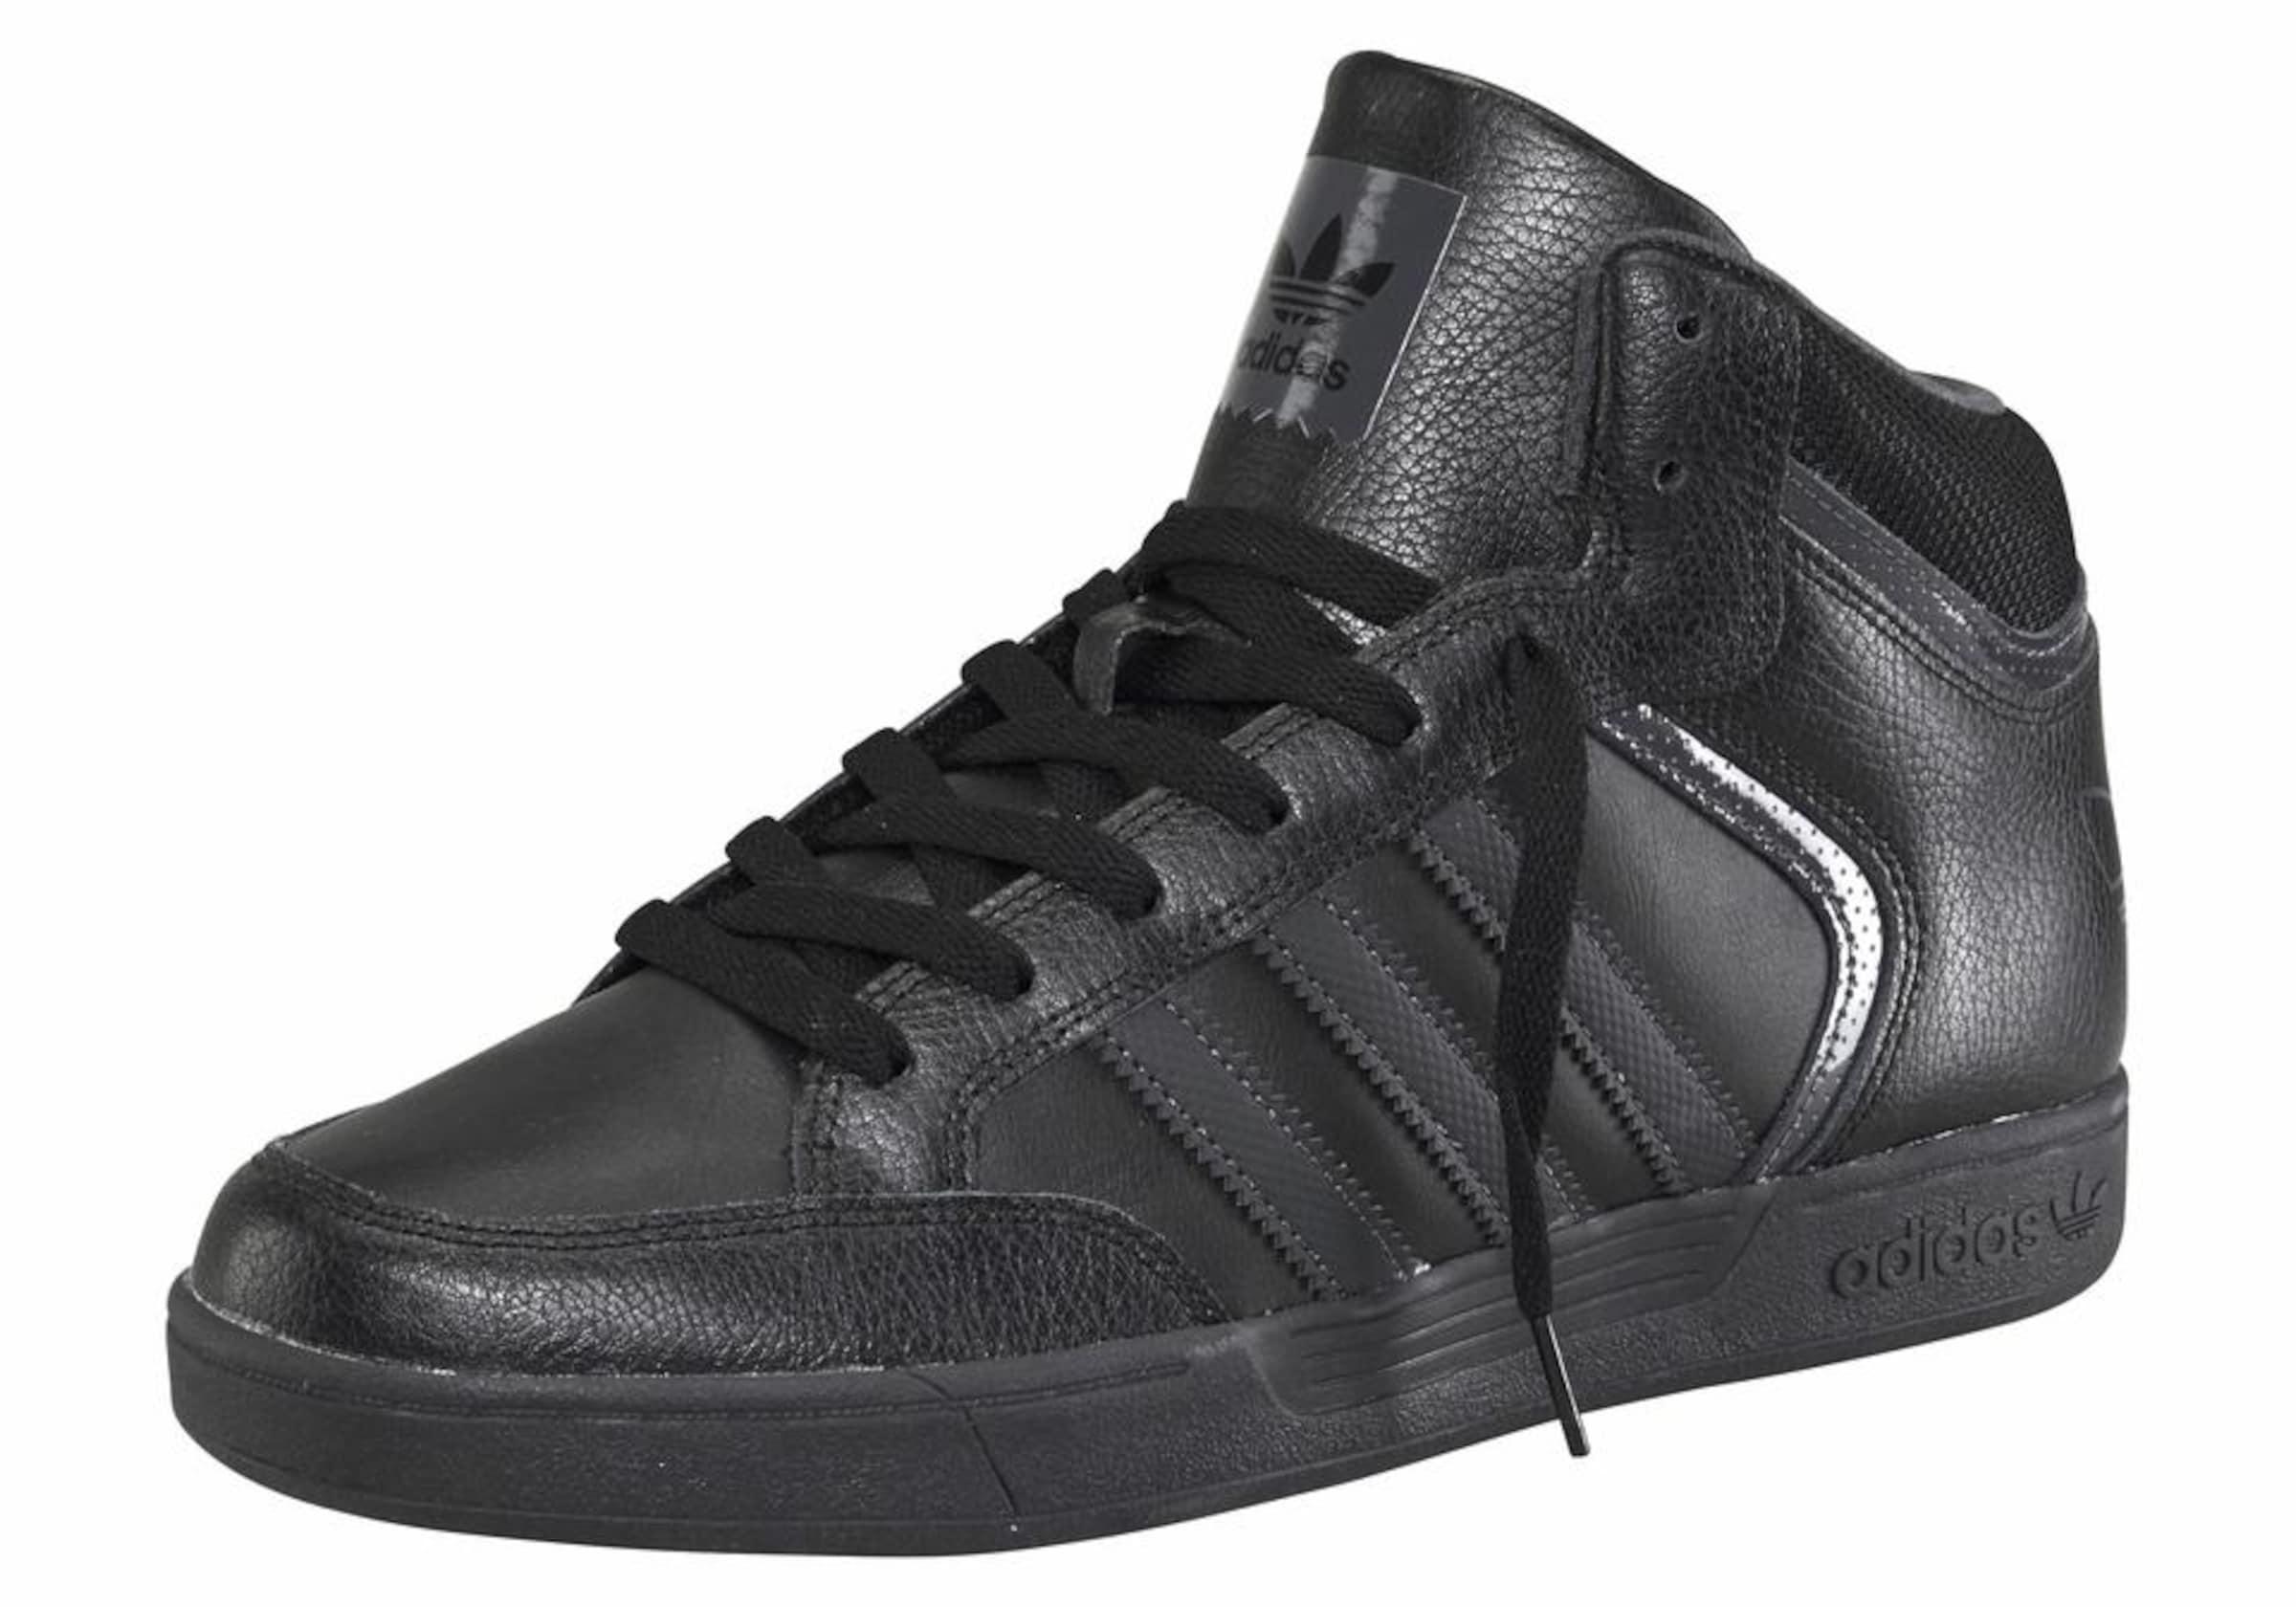 ADIDAS ORIGINALS Sneaker  Varial Mid